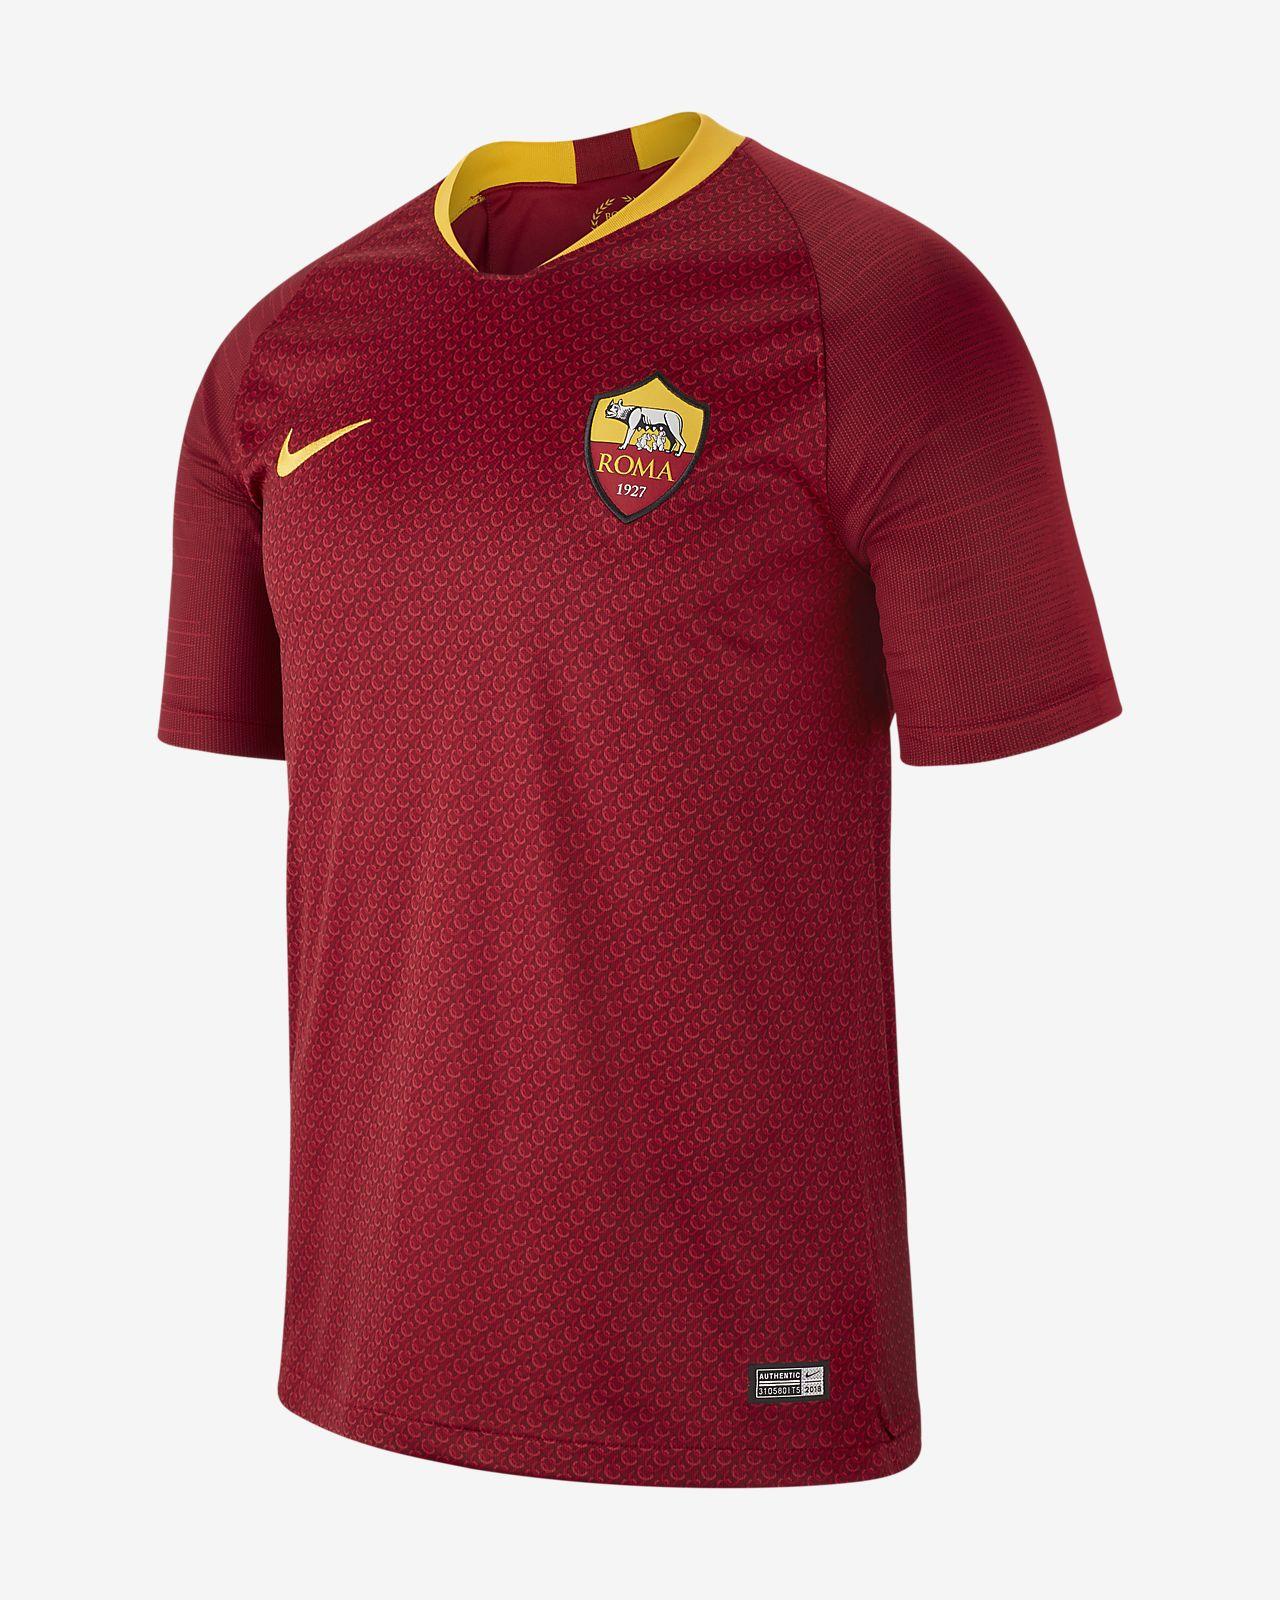 dcffd4d30f7ed Camiseta de fútbol para hombre 2018 19 A.S. Roma Stadium Home. Nike ...